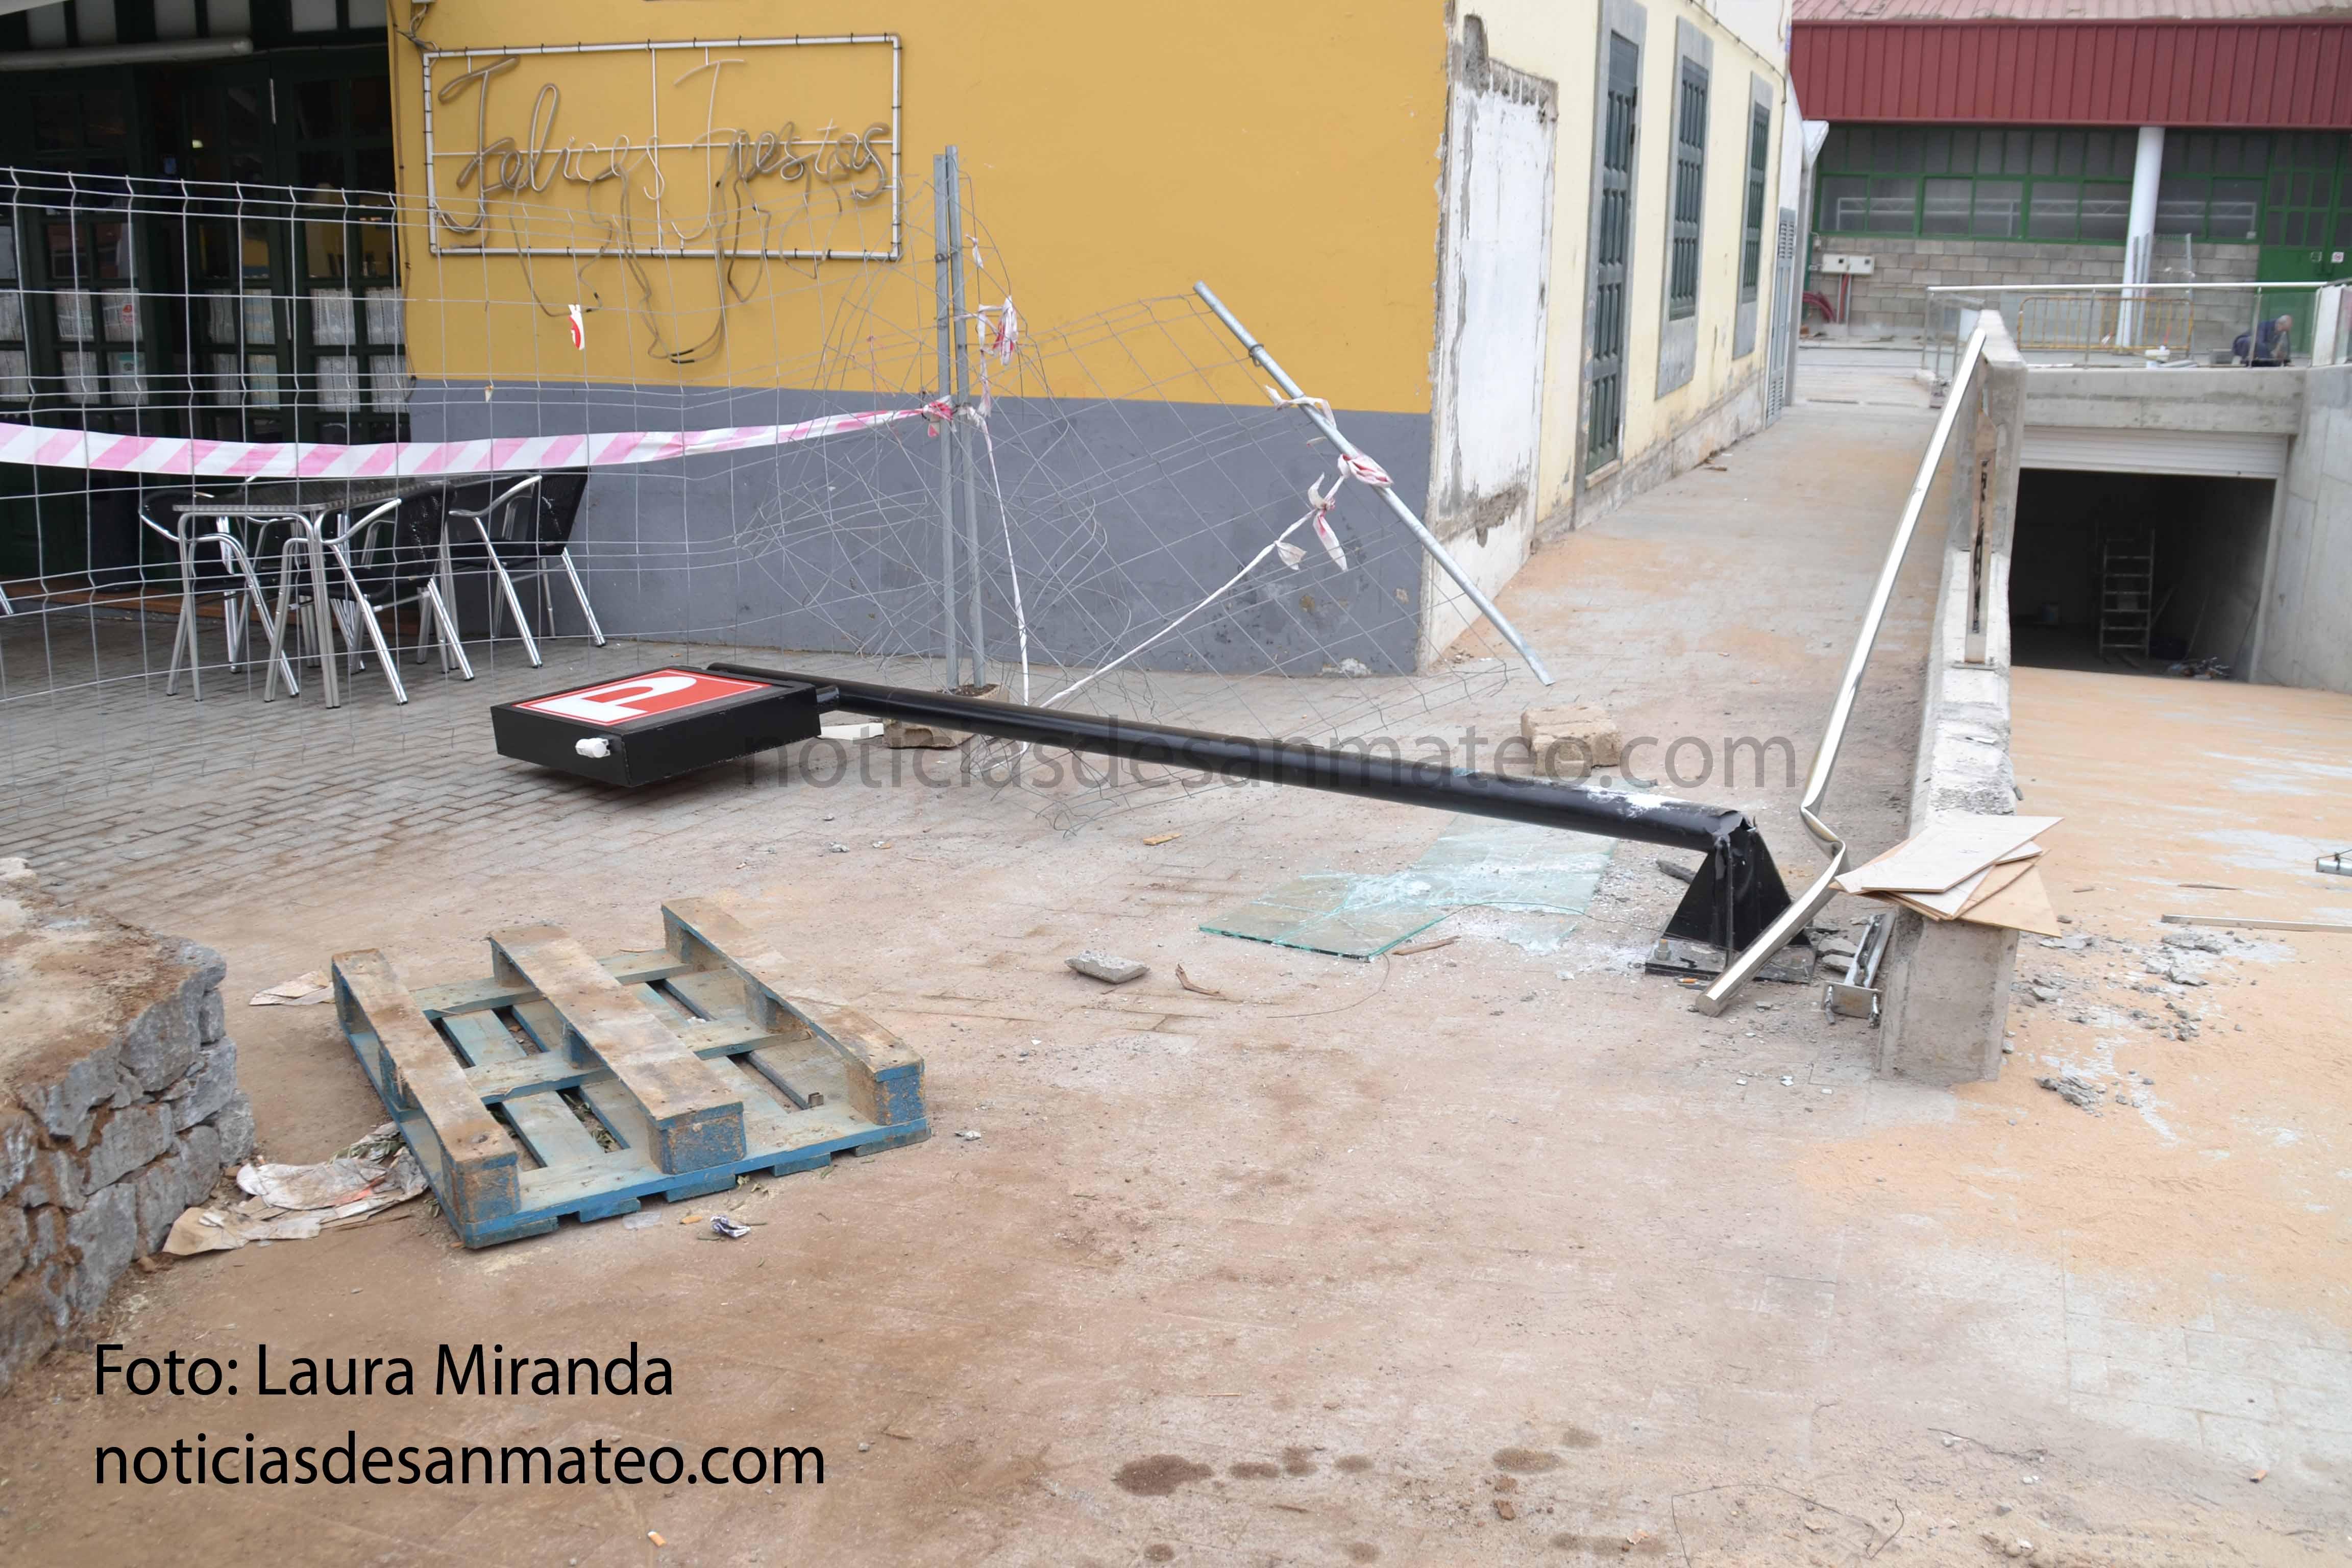 guagua se estrella contra la nueva obra del mercado 2 de marzo 2017 Foto Laura Miranda